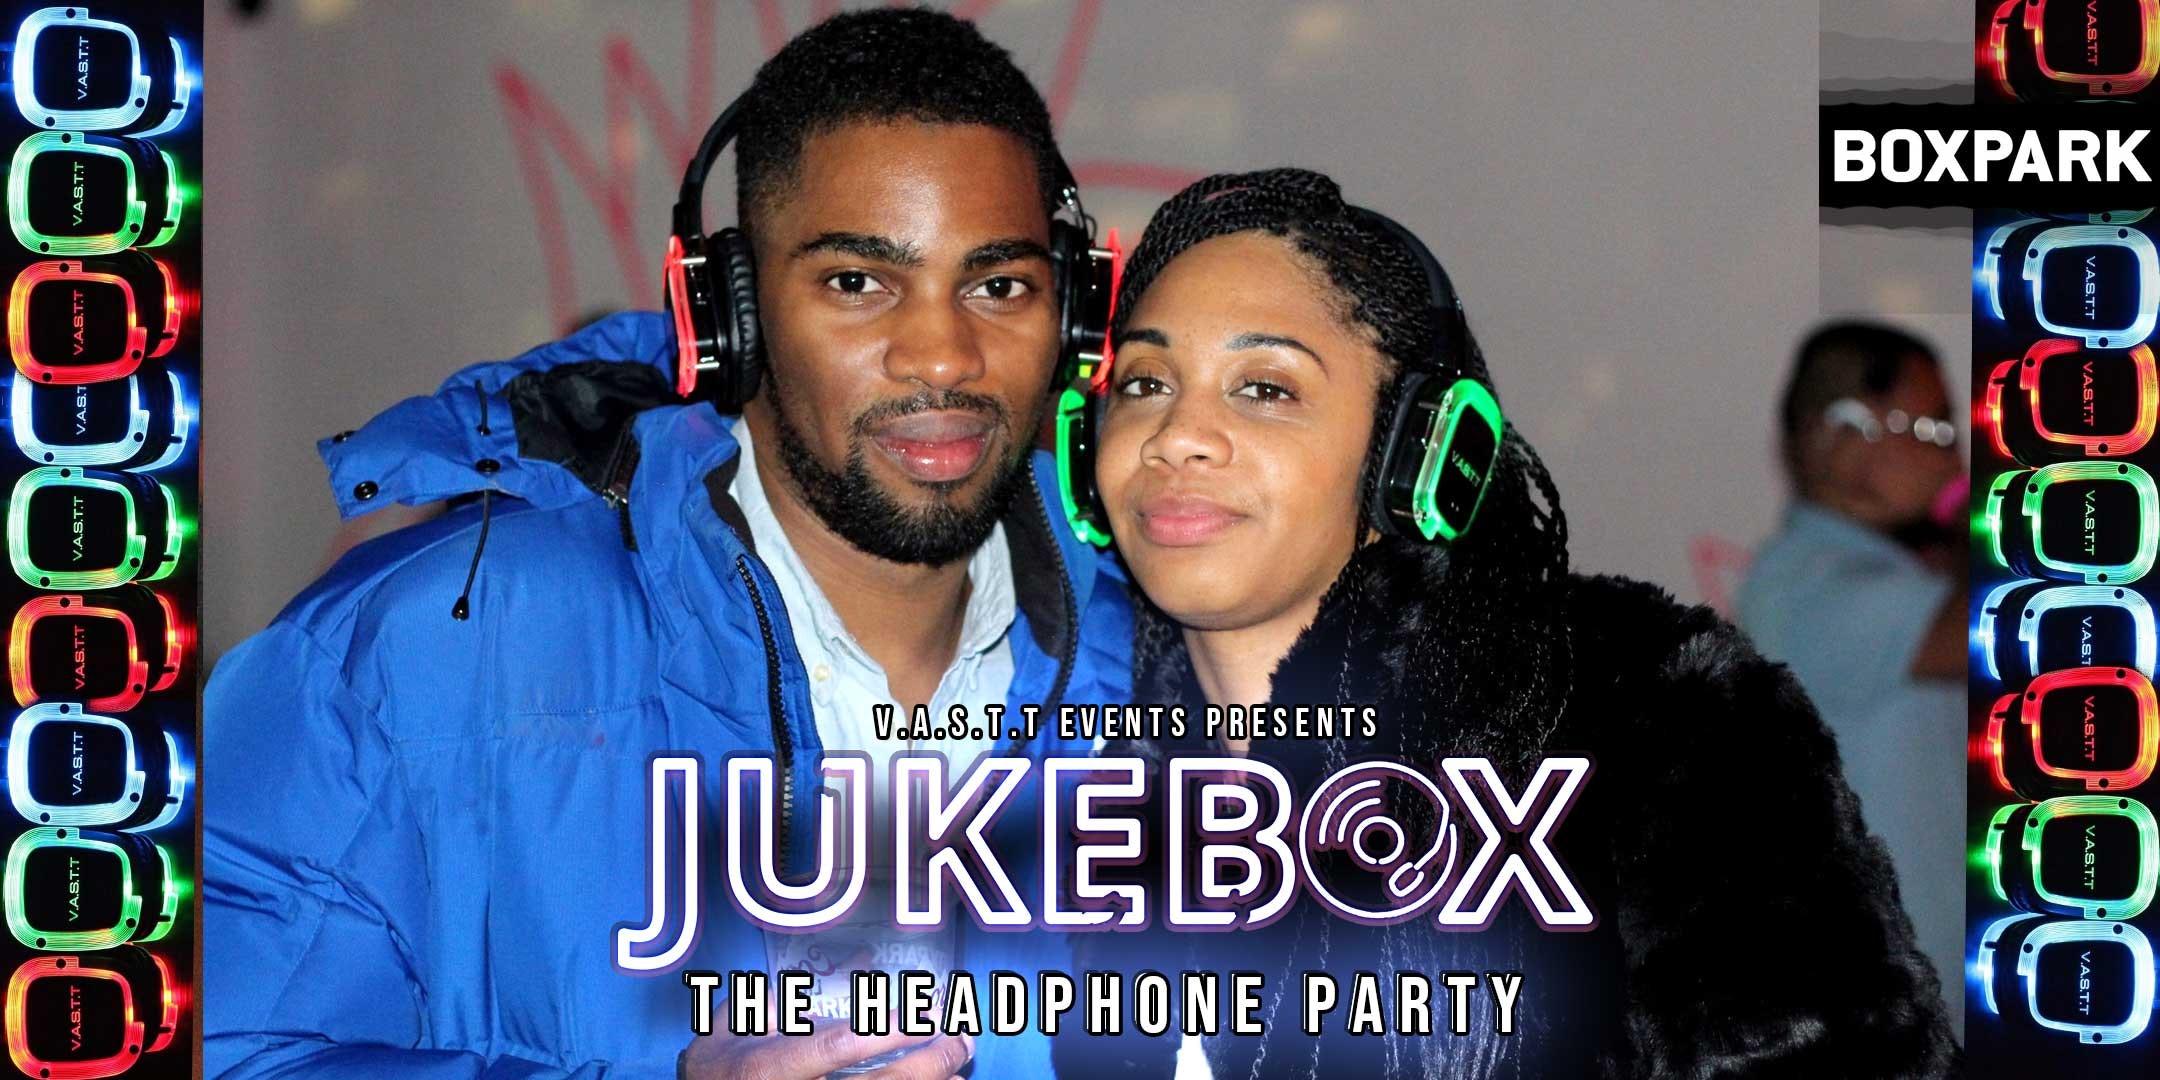 Jukebox- The Headphone Party@Boxpark Croydon